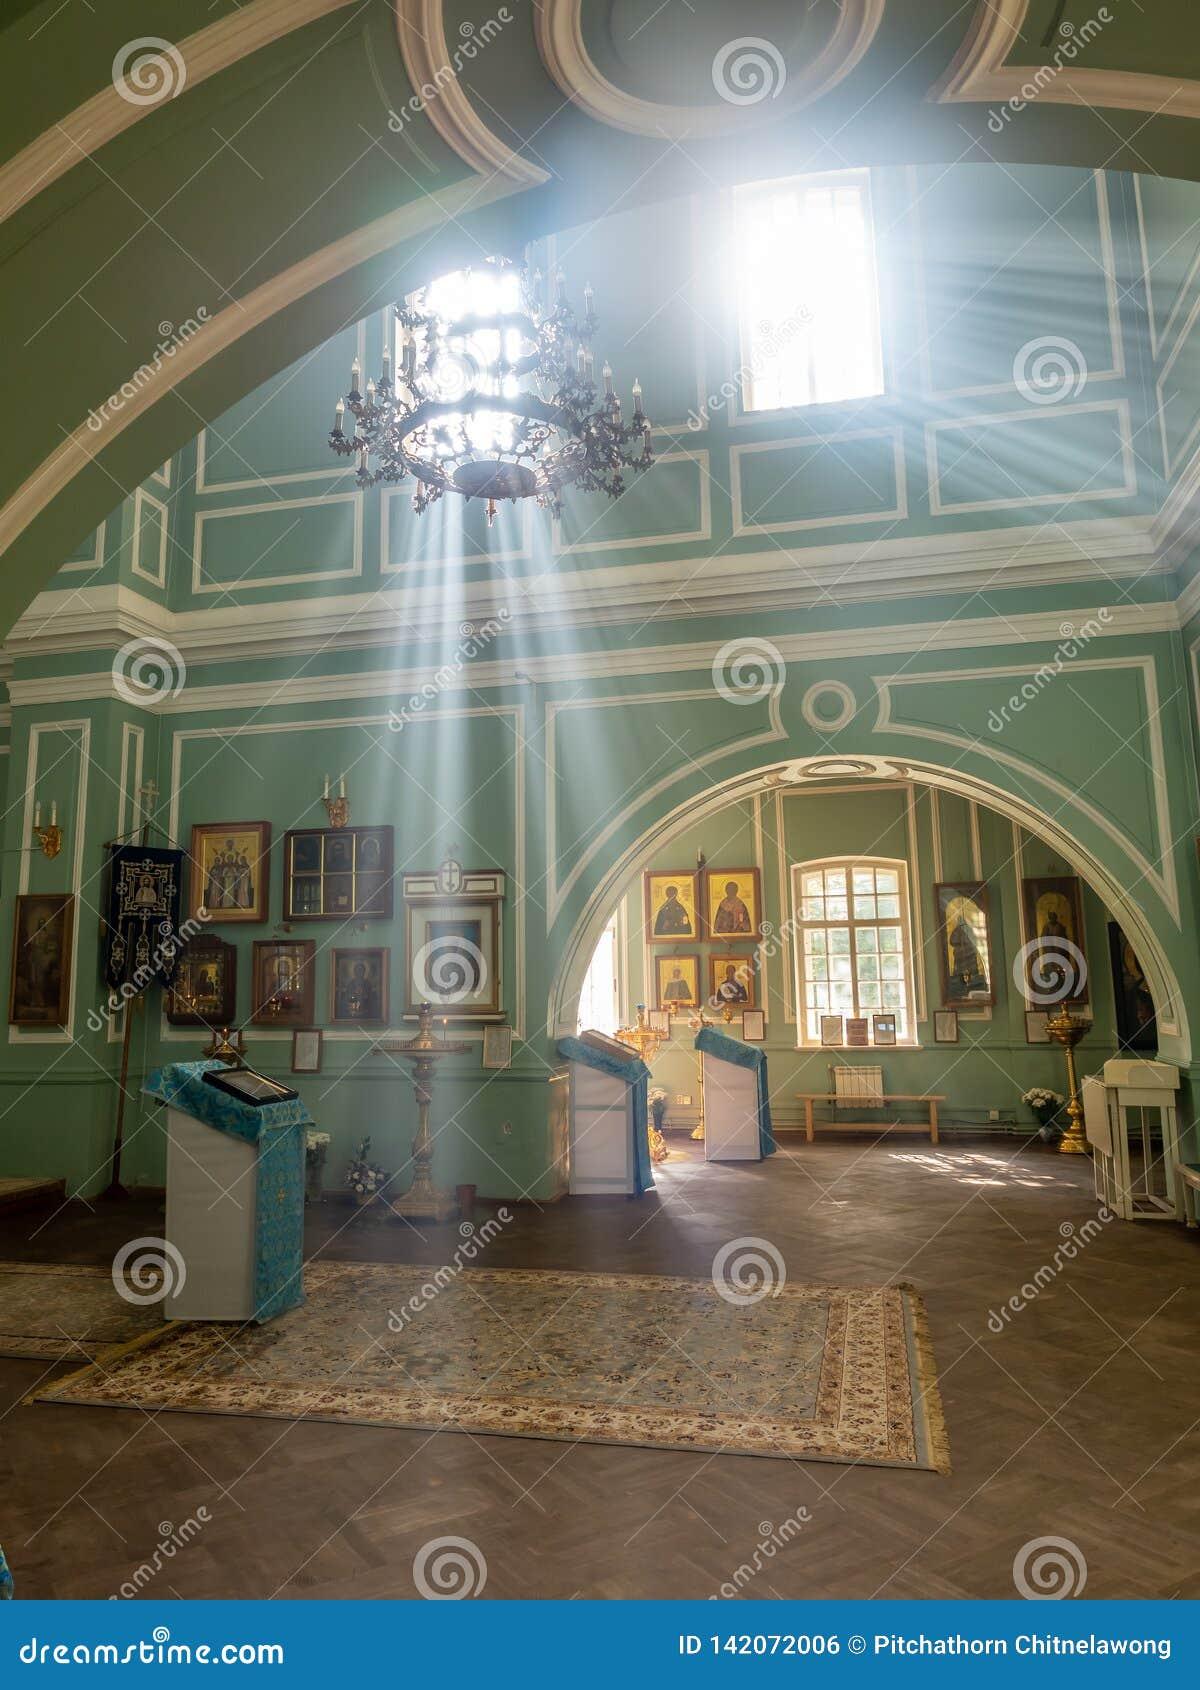 Inside of Znamenskaya church in Catherine palace, Russia